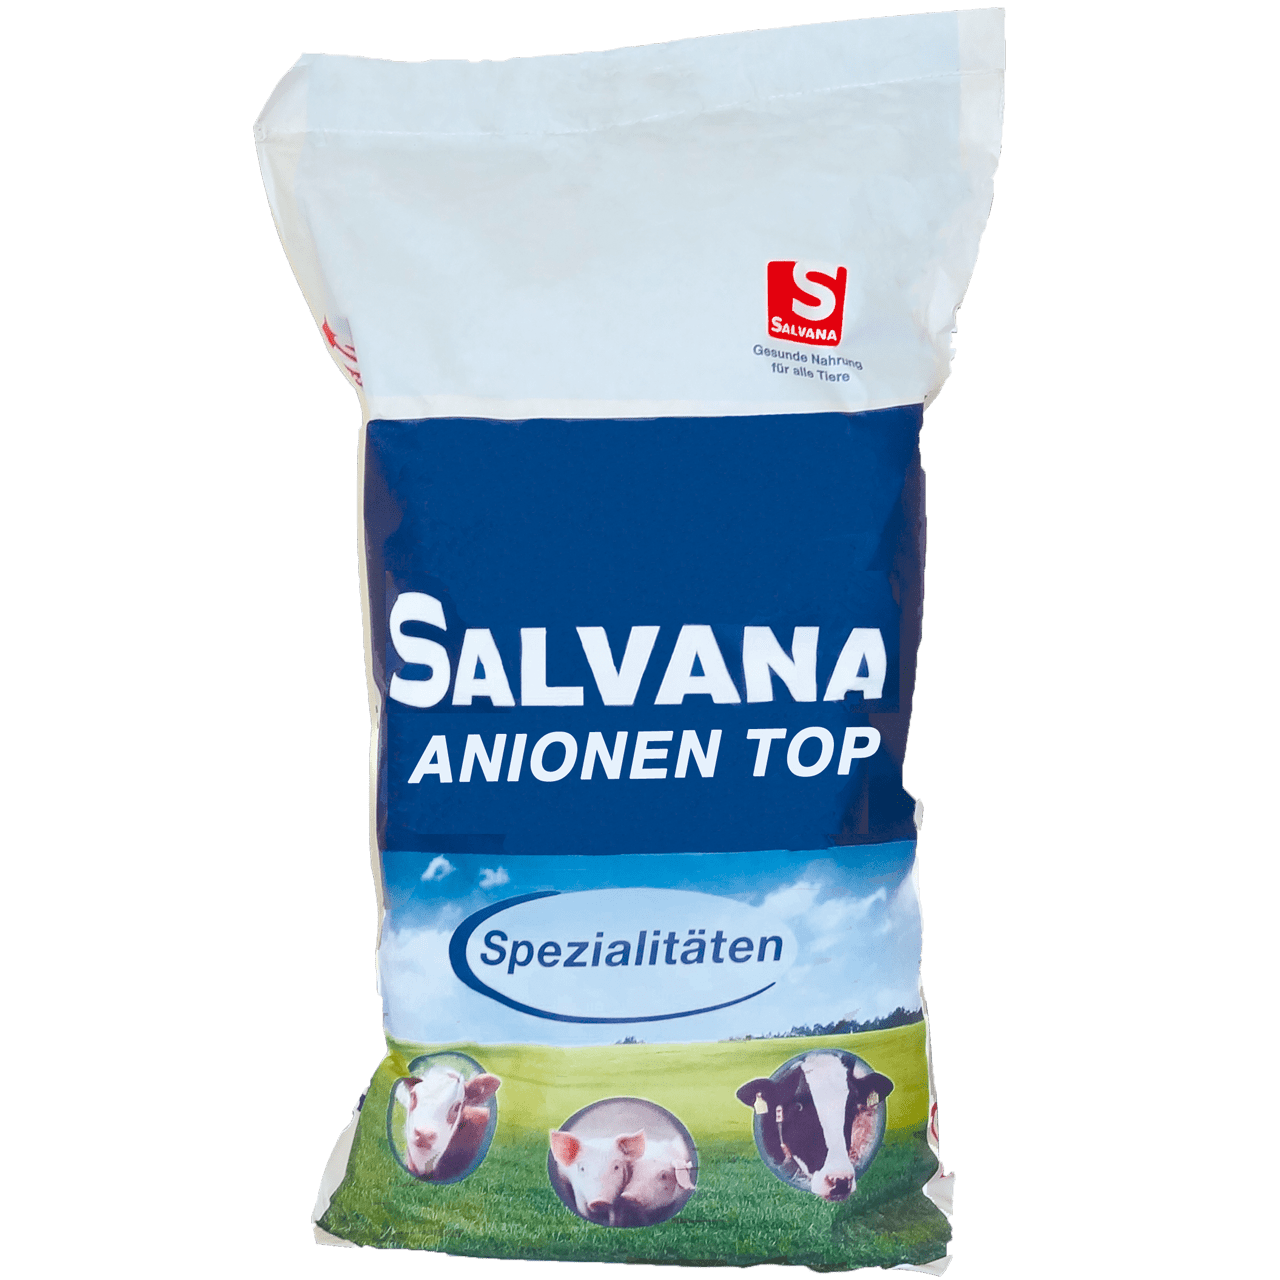 SALVANA ANIONEN-TOP